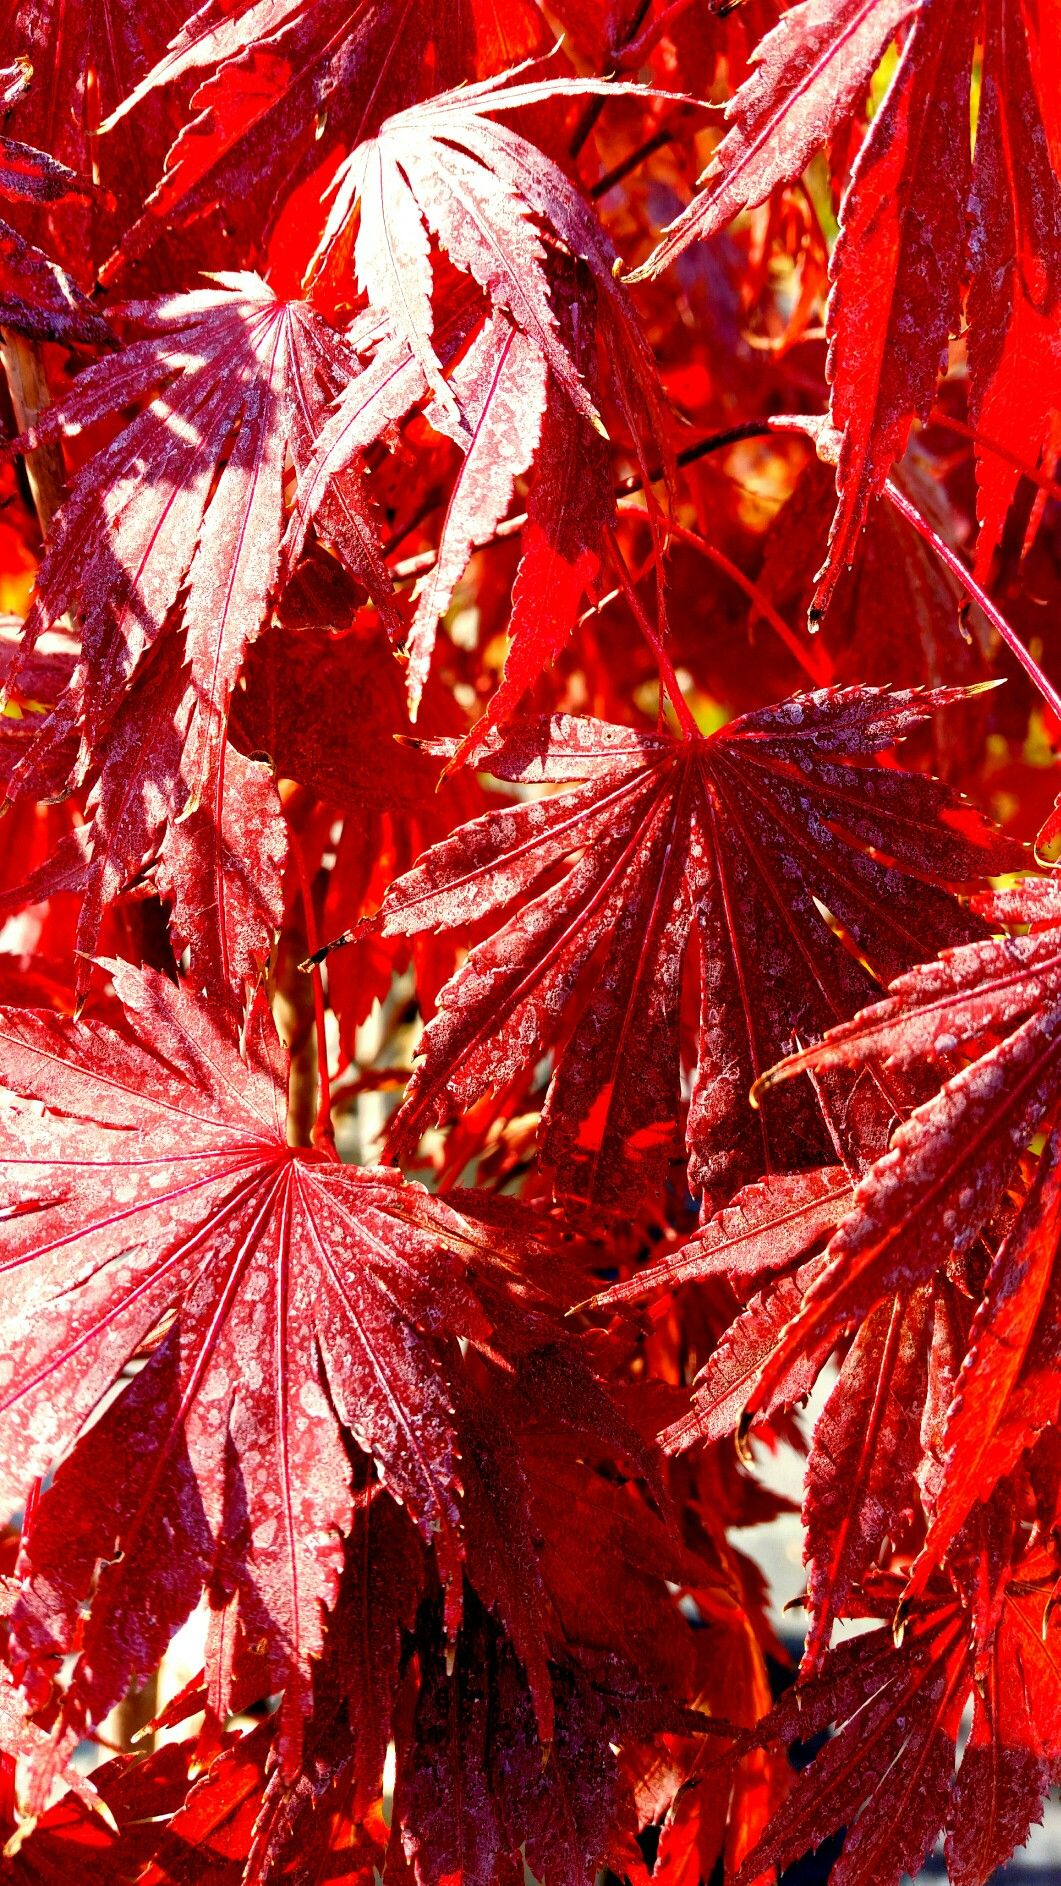 Acero Blu Giapponese acero ad ombrello foglia rossa - acer dissectum garnet